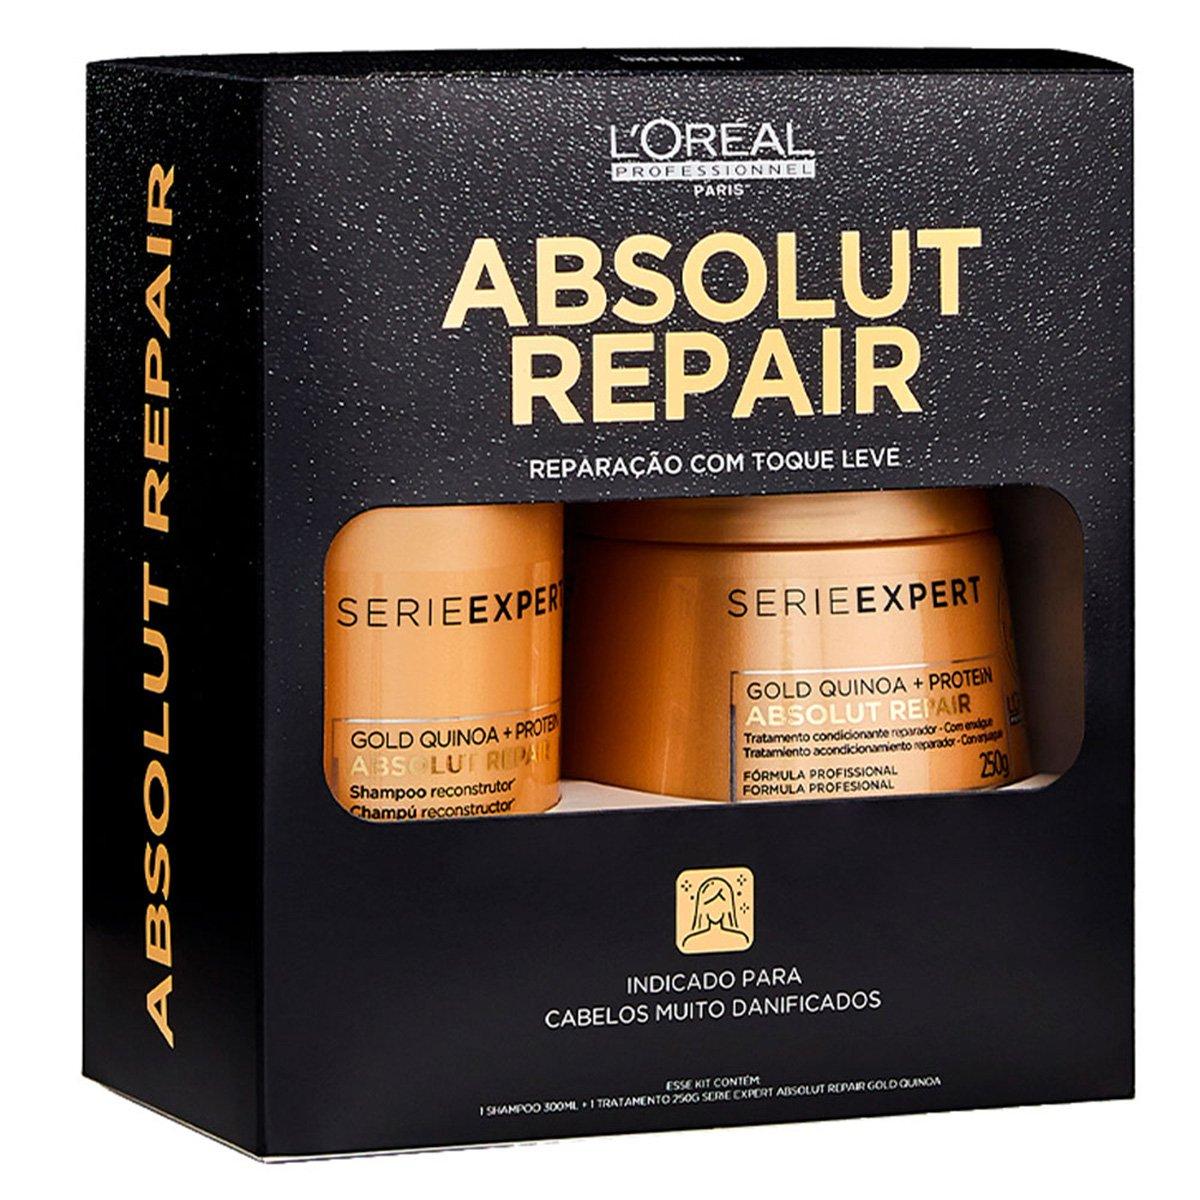 Kit L'Oréal Professionnel Absolut Repair Condicionador + Máscara de Tratamento